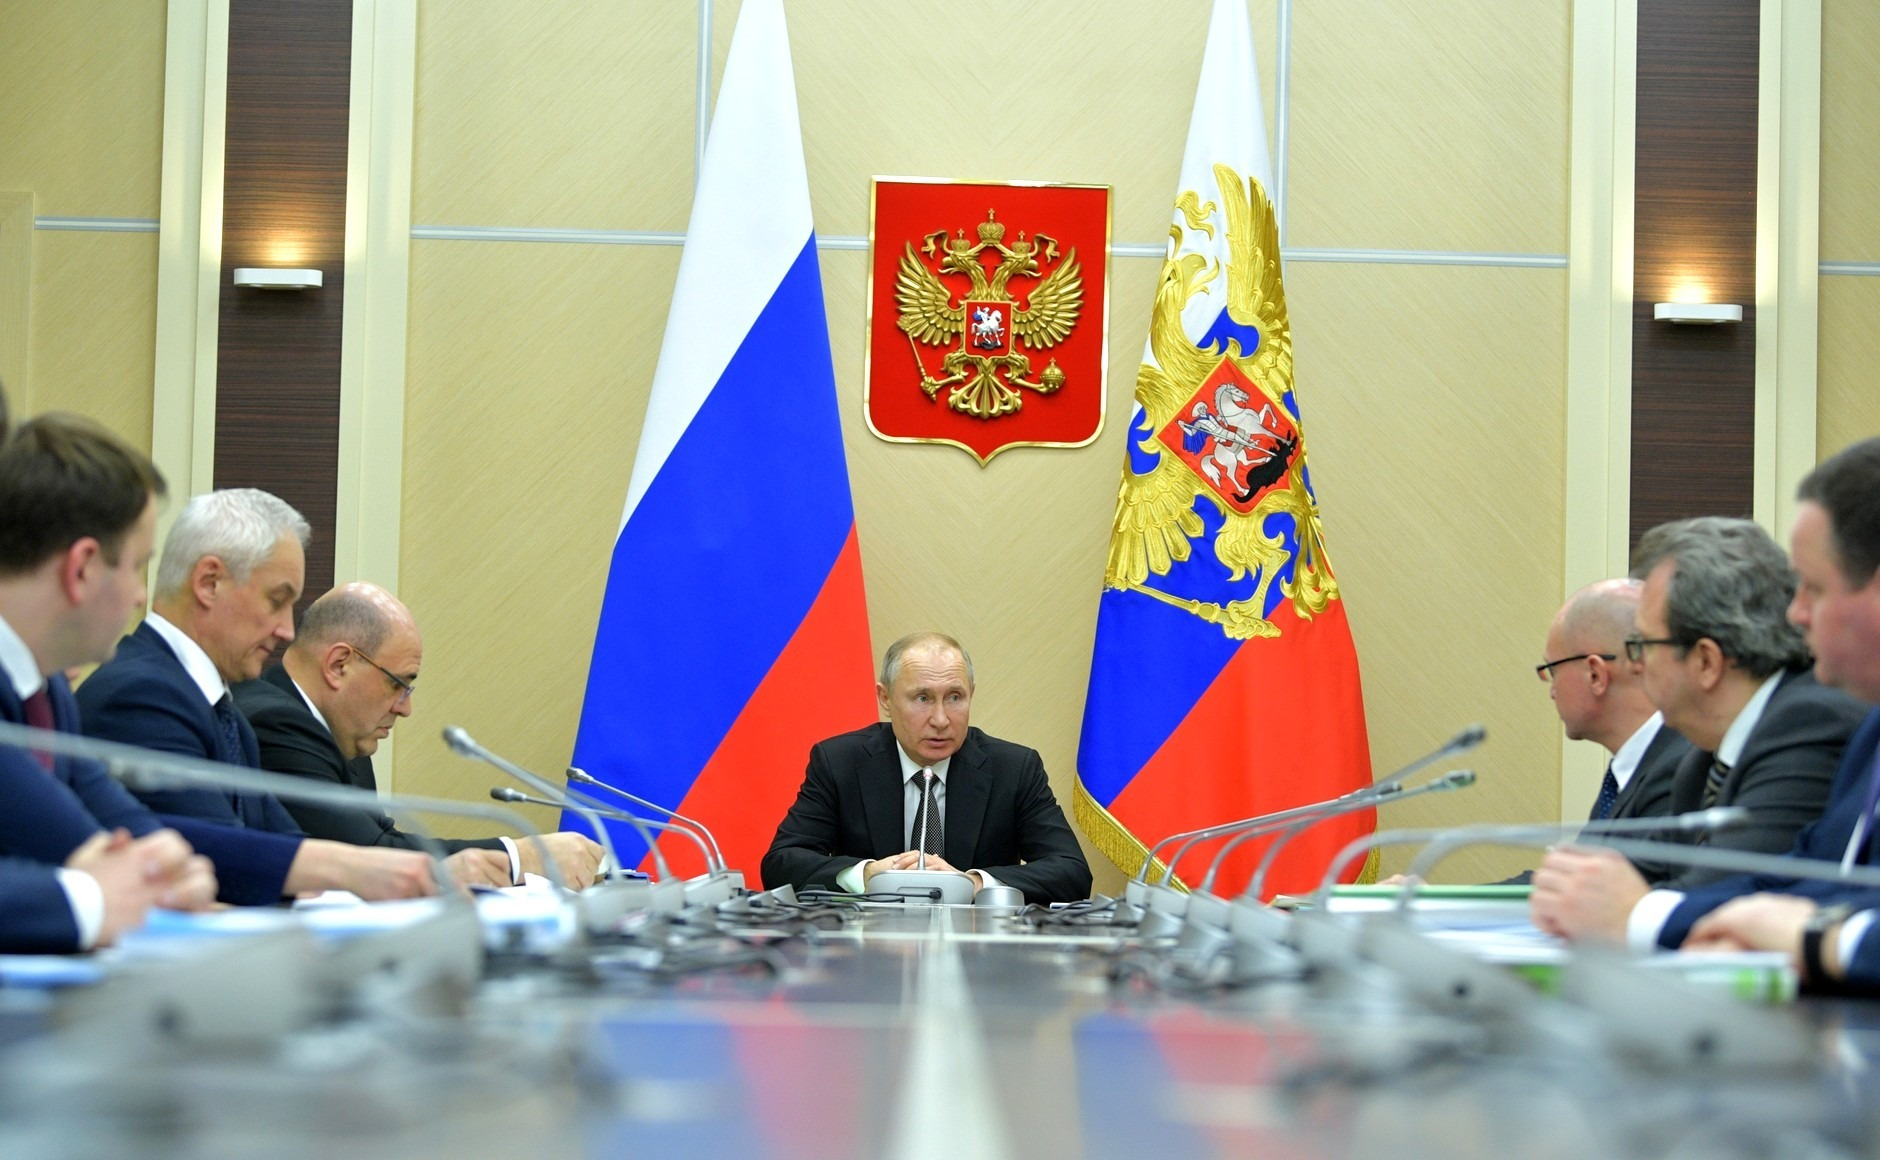 «Система неэффективна, и Путин бессилен внутри нее»